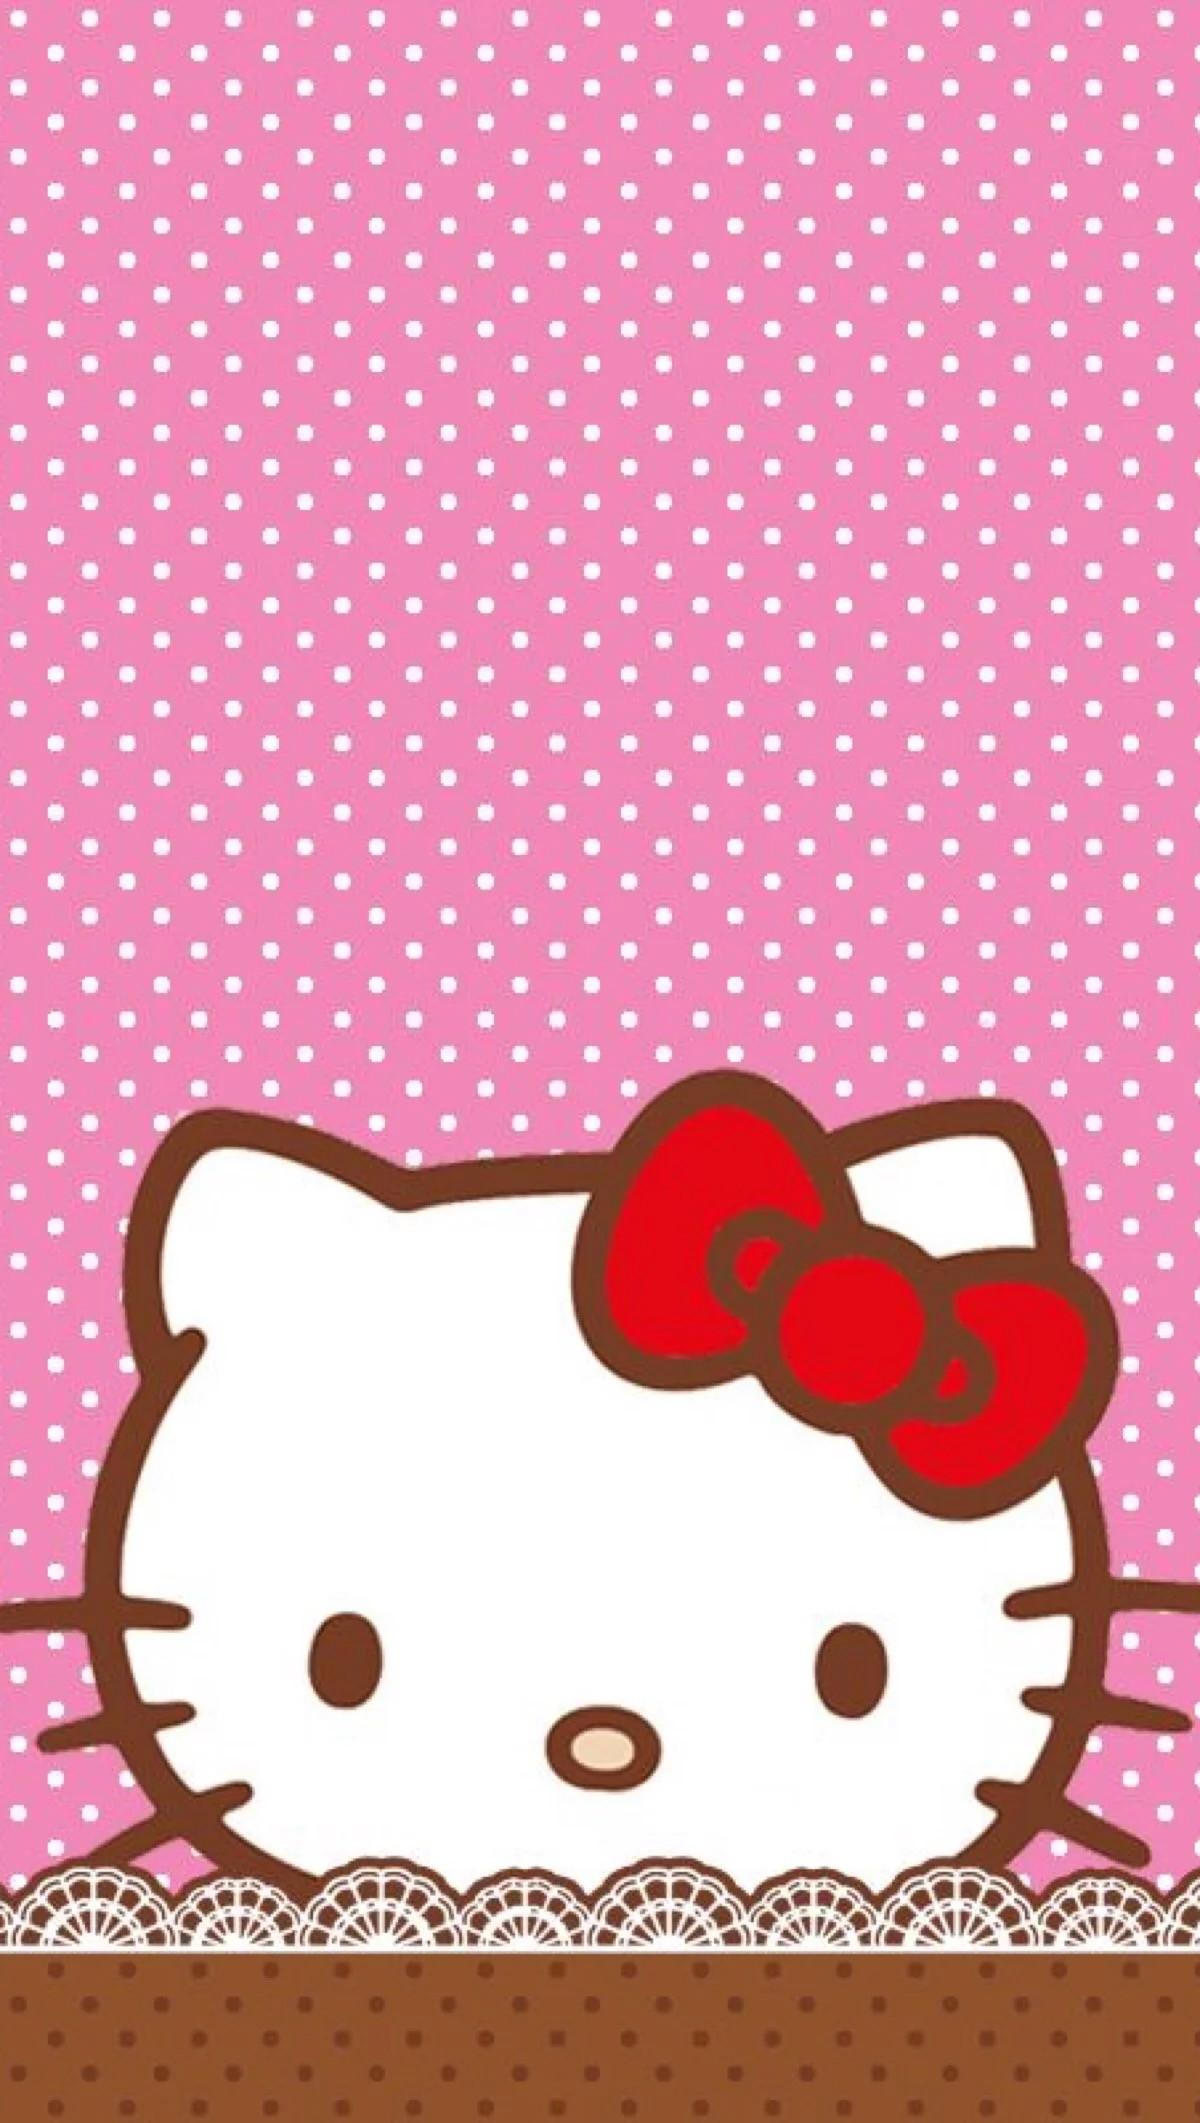 Hello Kitty Wallpaper, Iphone Wallpaper, Kawaii, Cartoon, Walls, Love